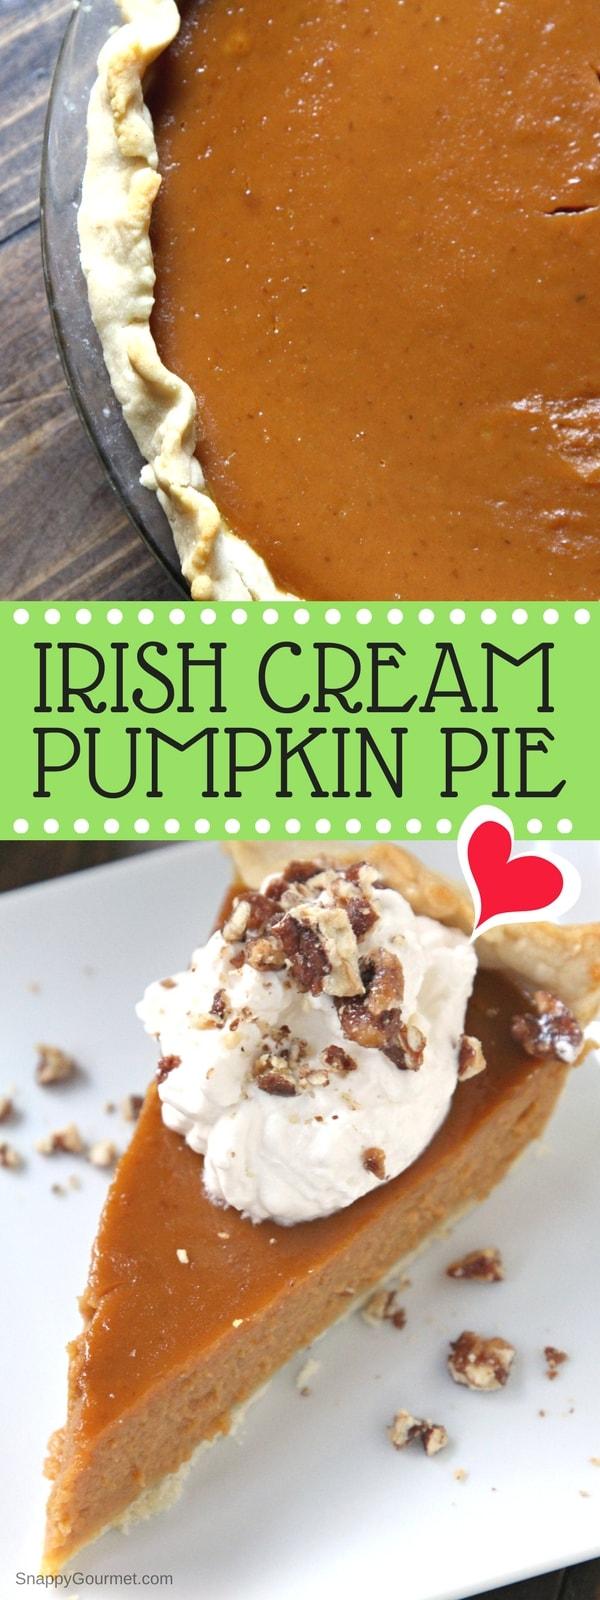 IRISH CREAM PUMPKIN PIE RECIPE - easy homemade pumpkin pie with Bailey's and from scratch pie crust!